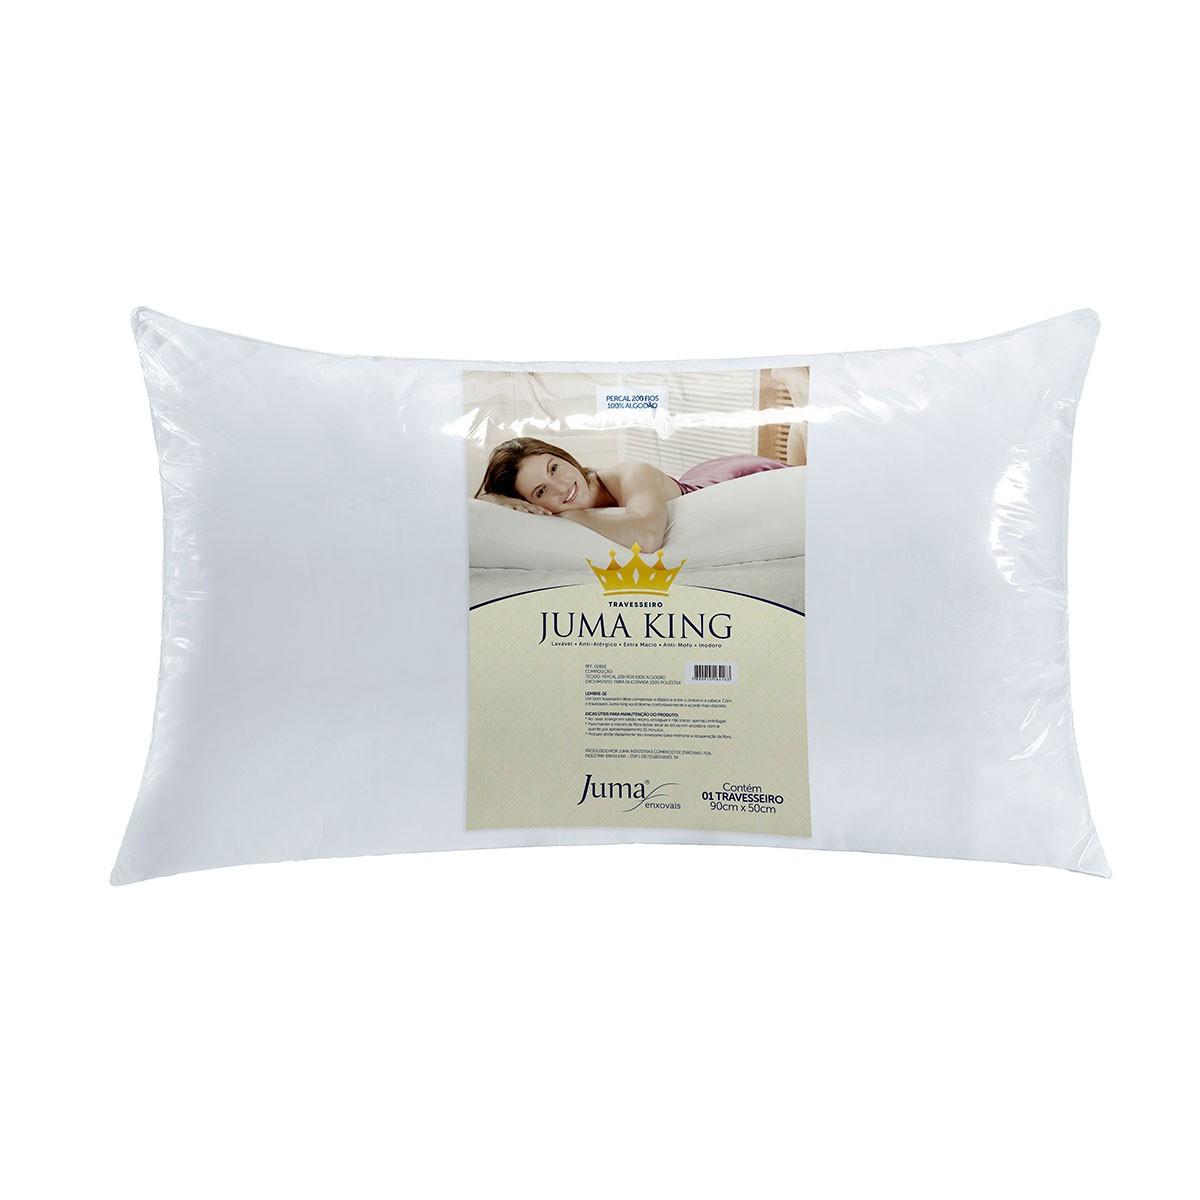 Travesseiro King Juma 90 x 50 cm Percal 200 Fios - Branco